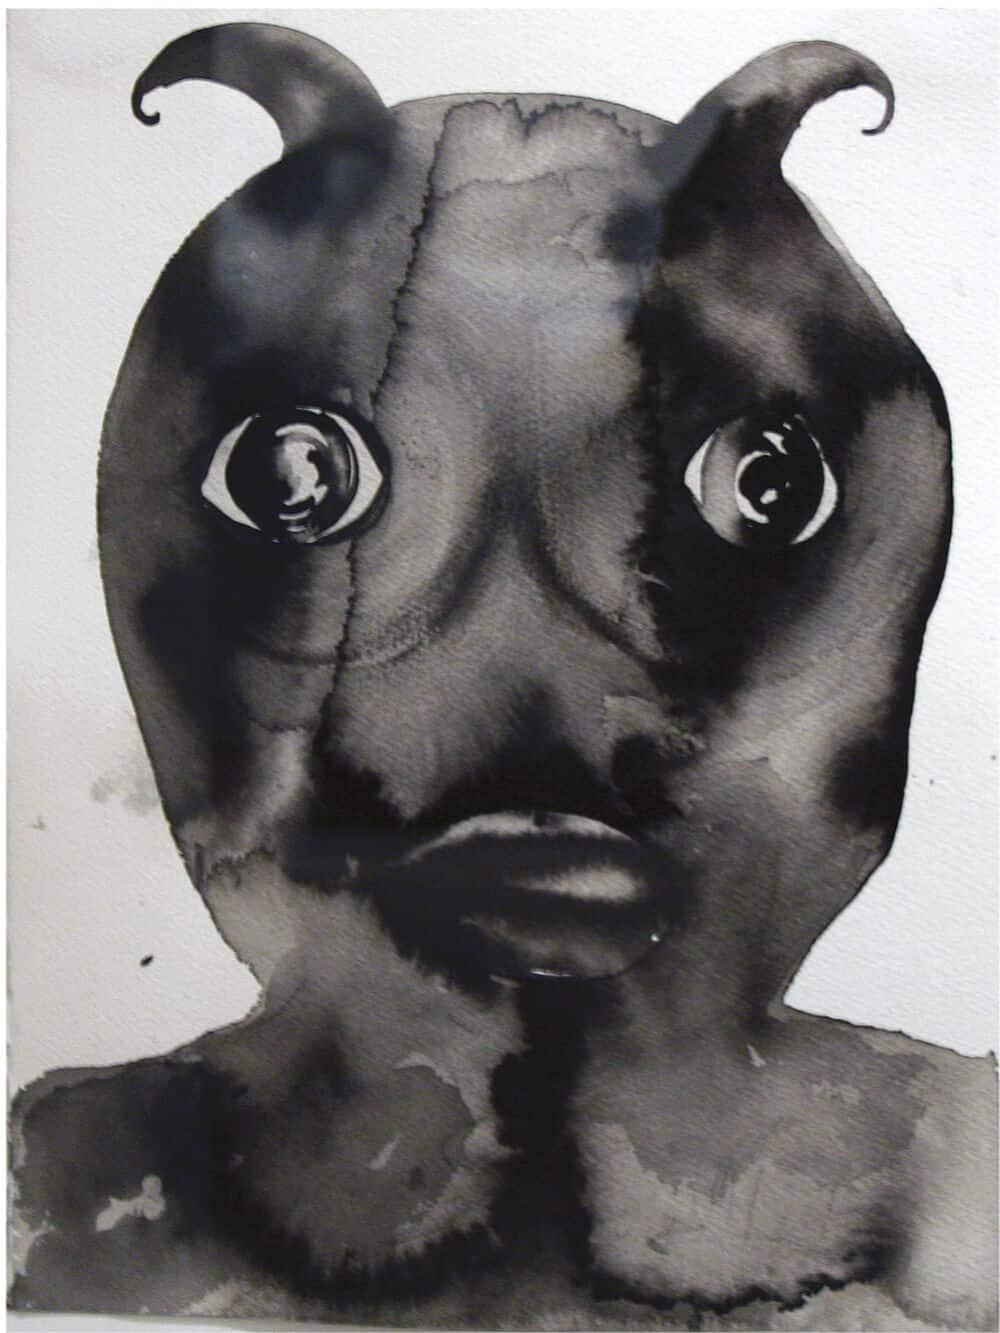 Barthélémy Togo, Devil Head No 2. ©Adagp, Paris. Images courtesy of Mario Mauroner Gallery, Vienna.